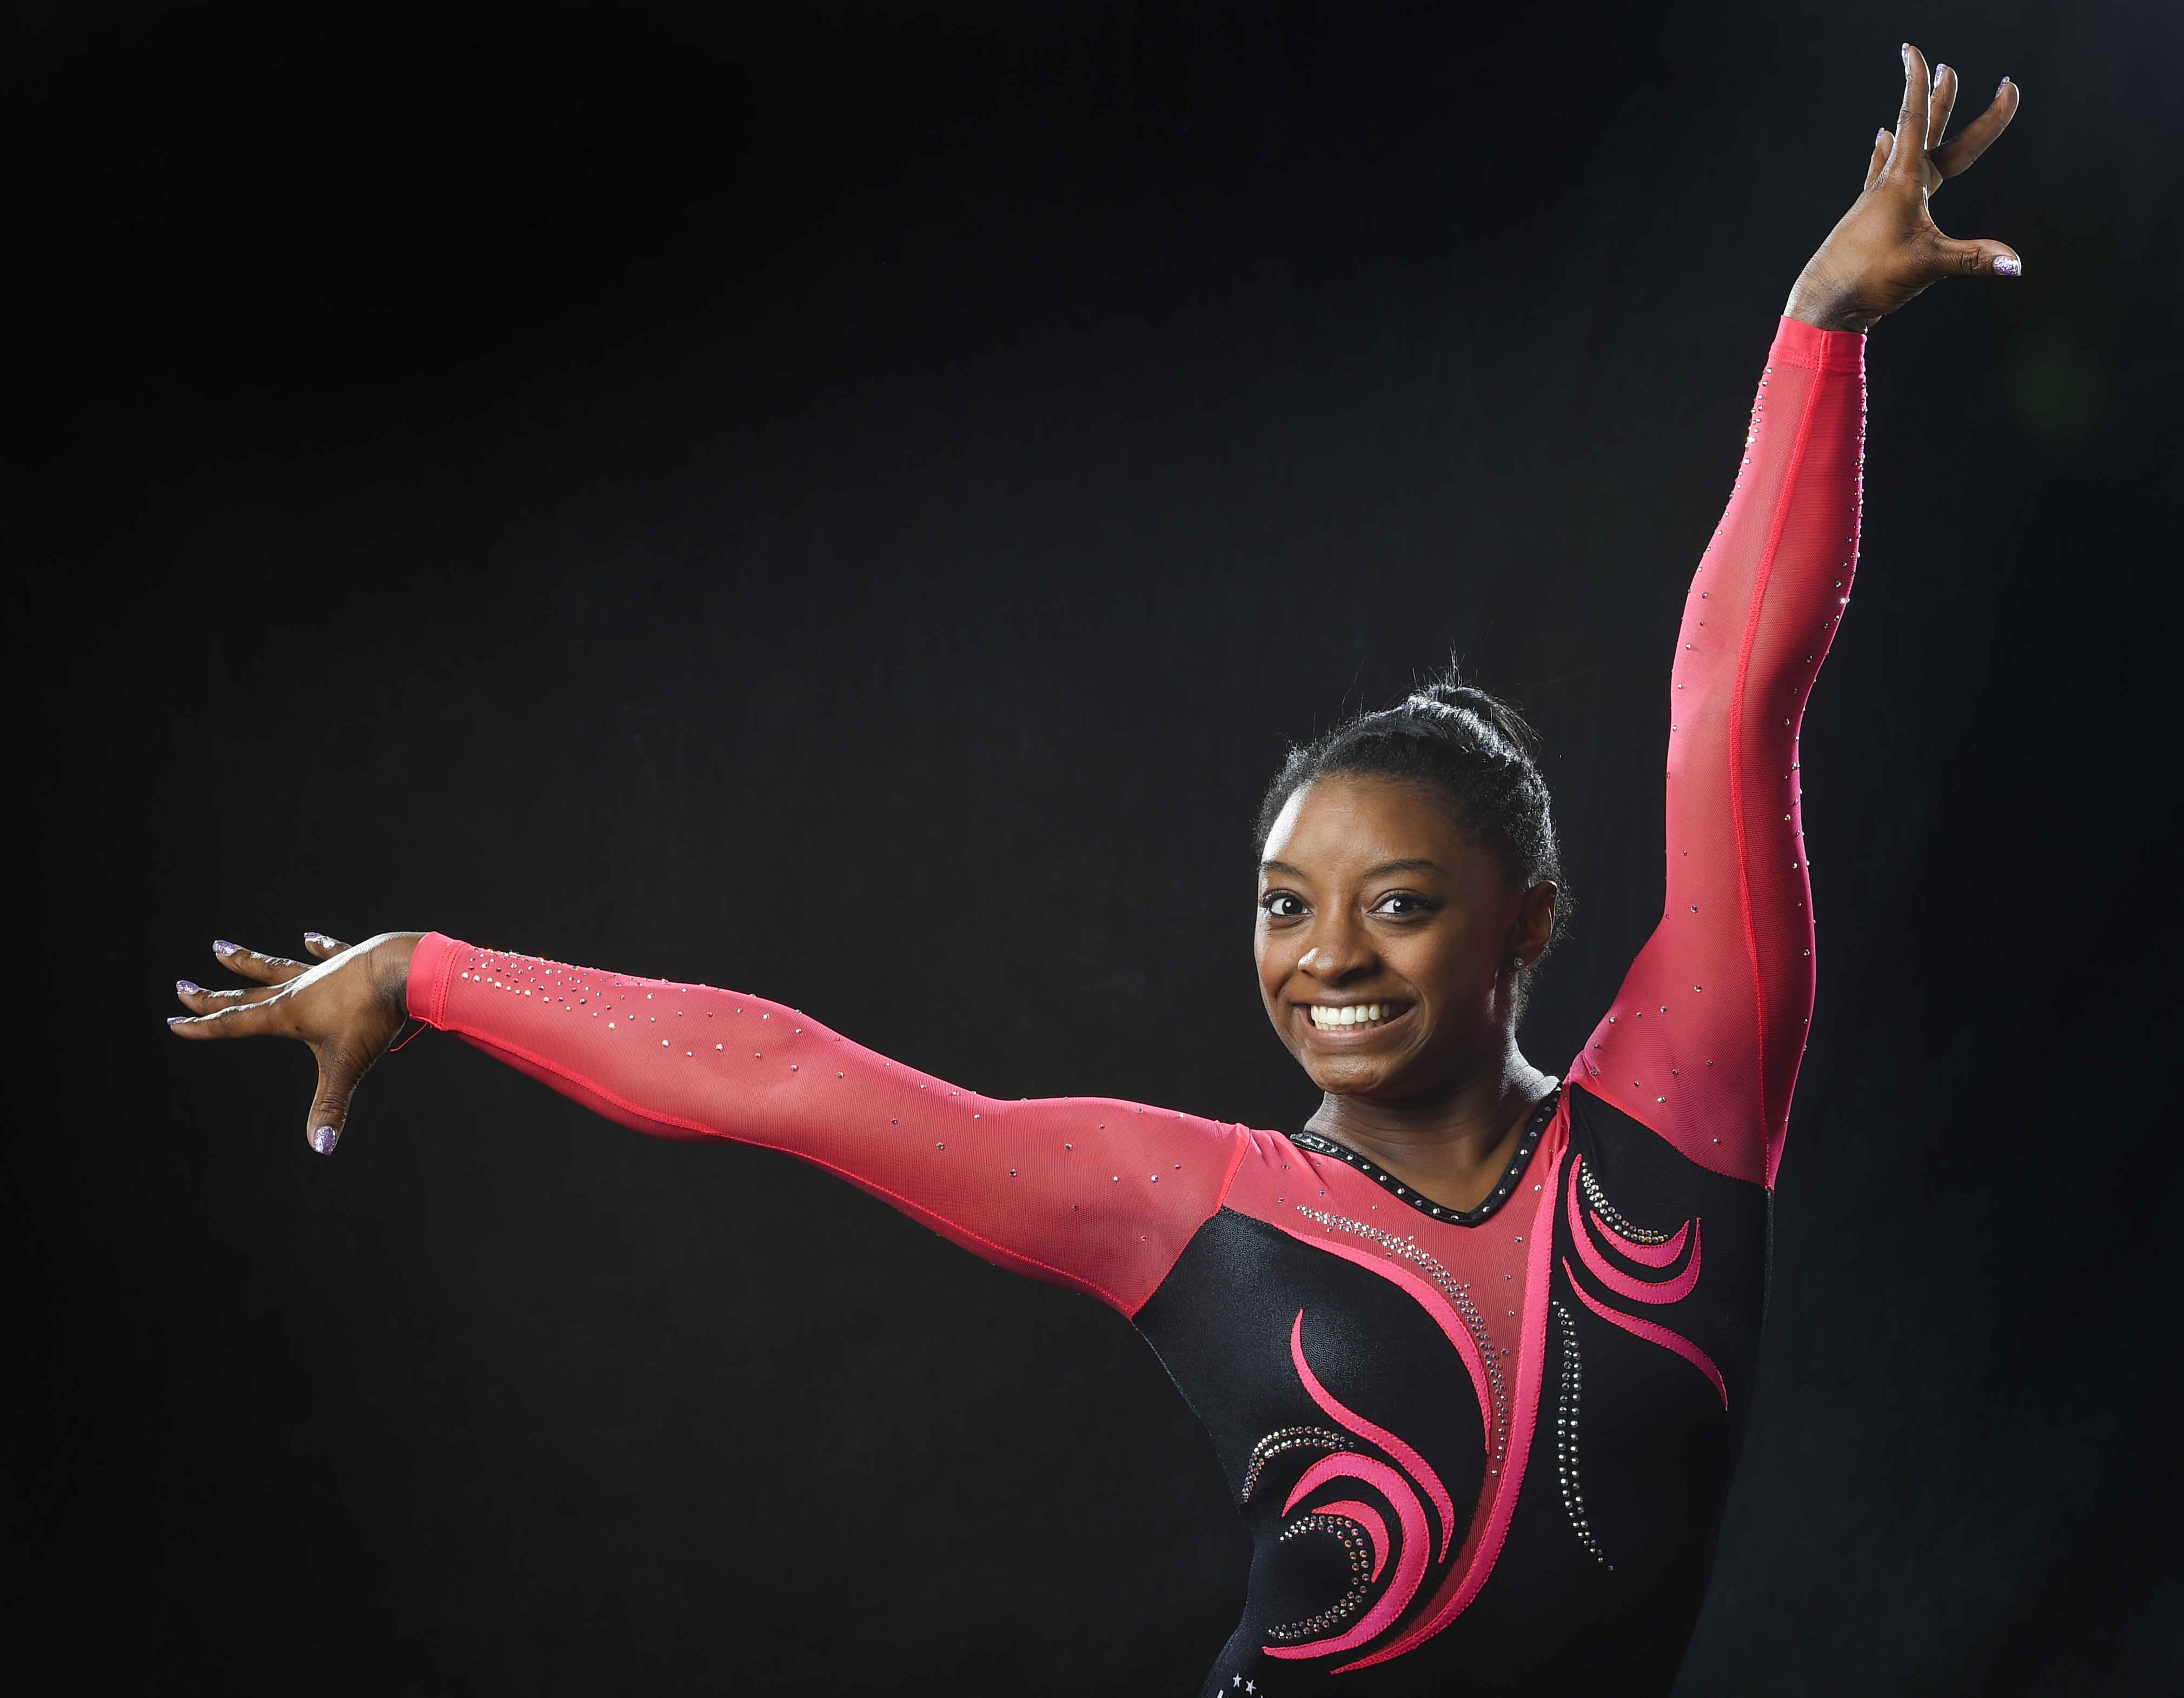 Meet Simone Biles Americas next great Olympic gymnast 4039x3141